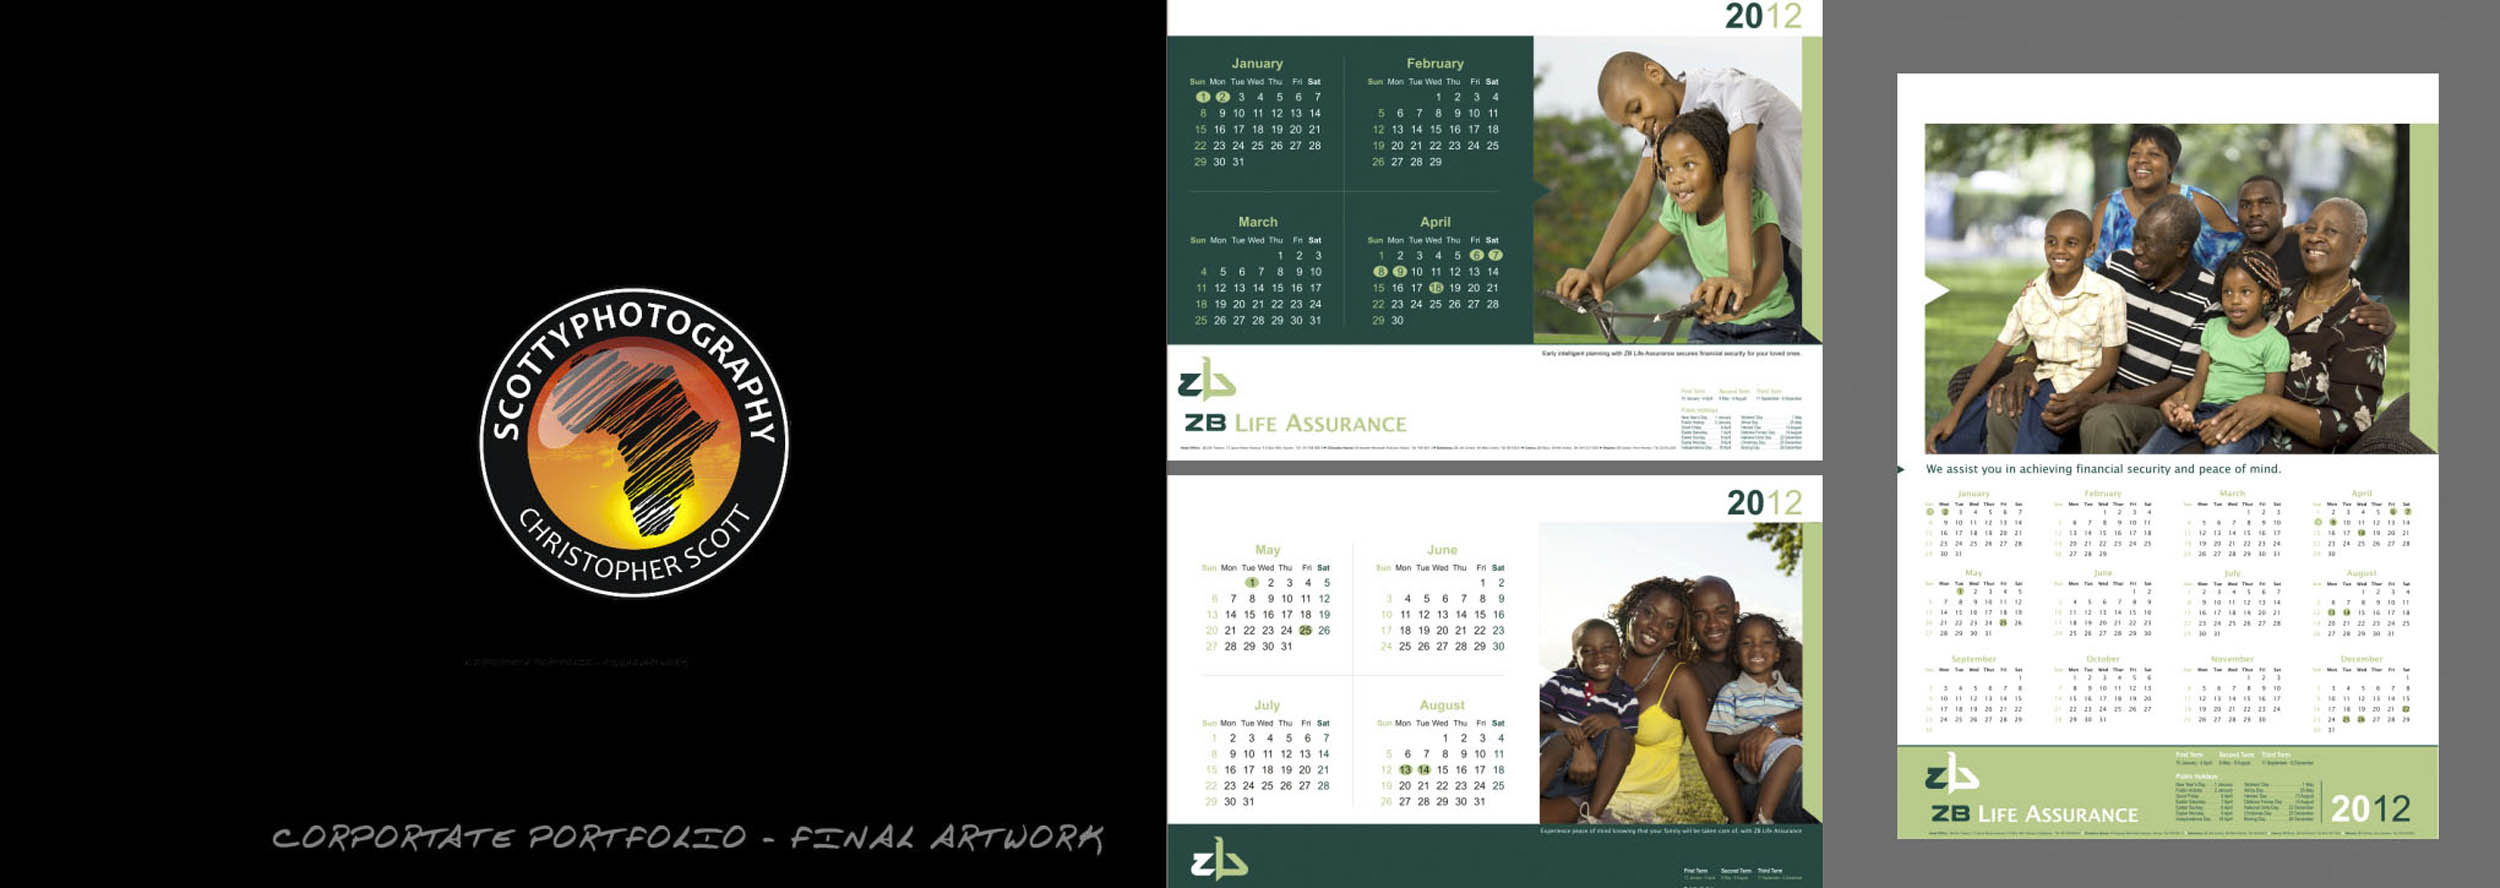 Corporate visual portfolio cover copy.jpg